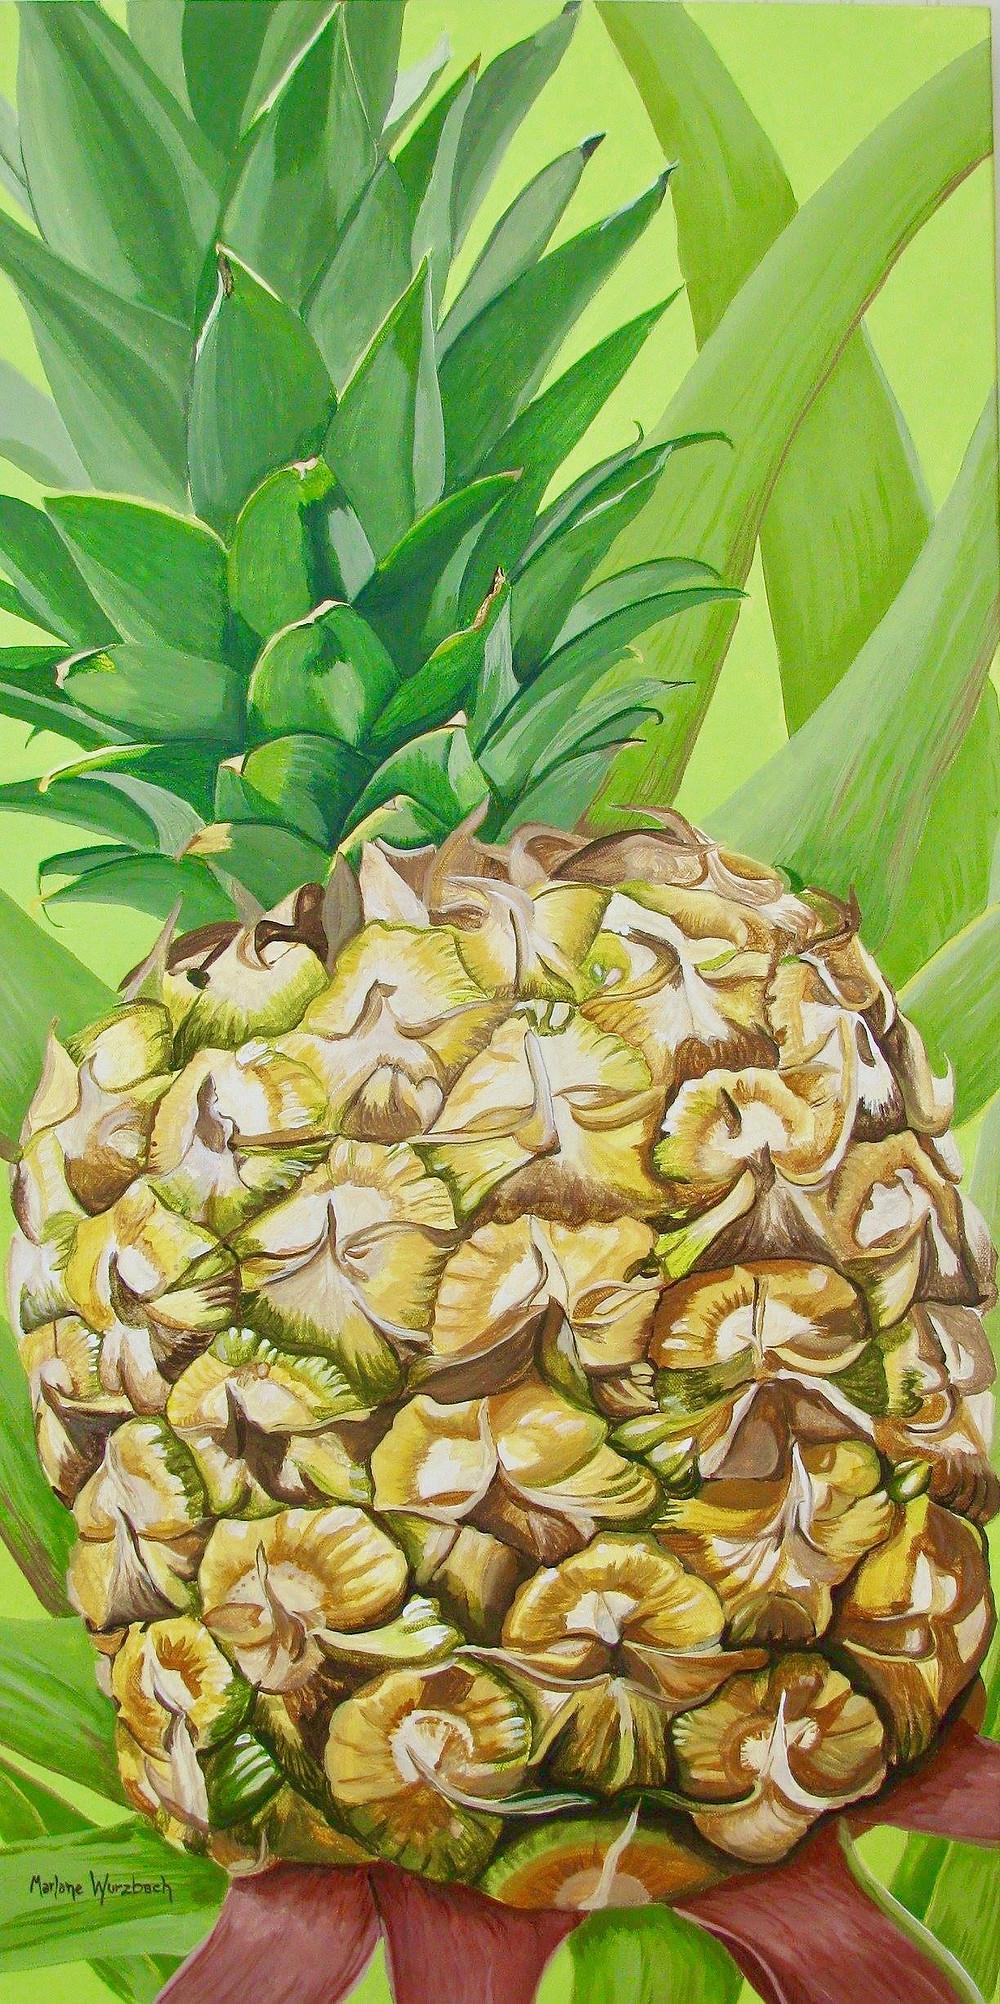 Pineapple - Maralane Wurzbach